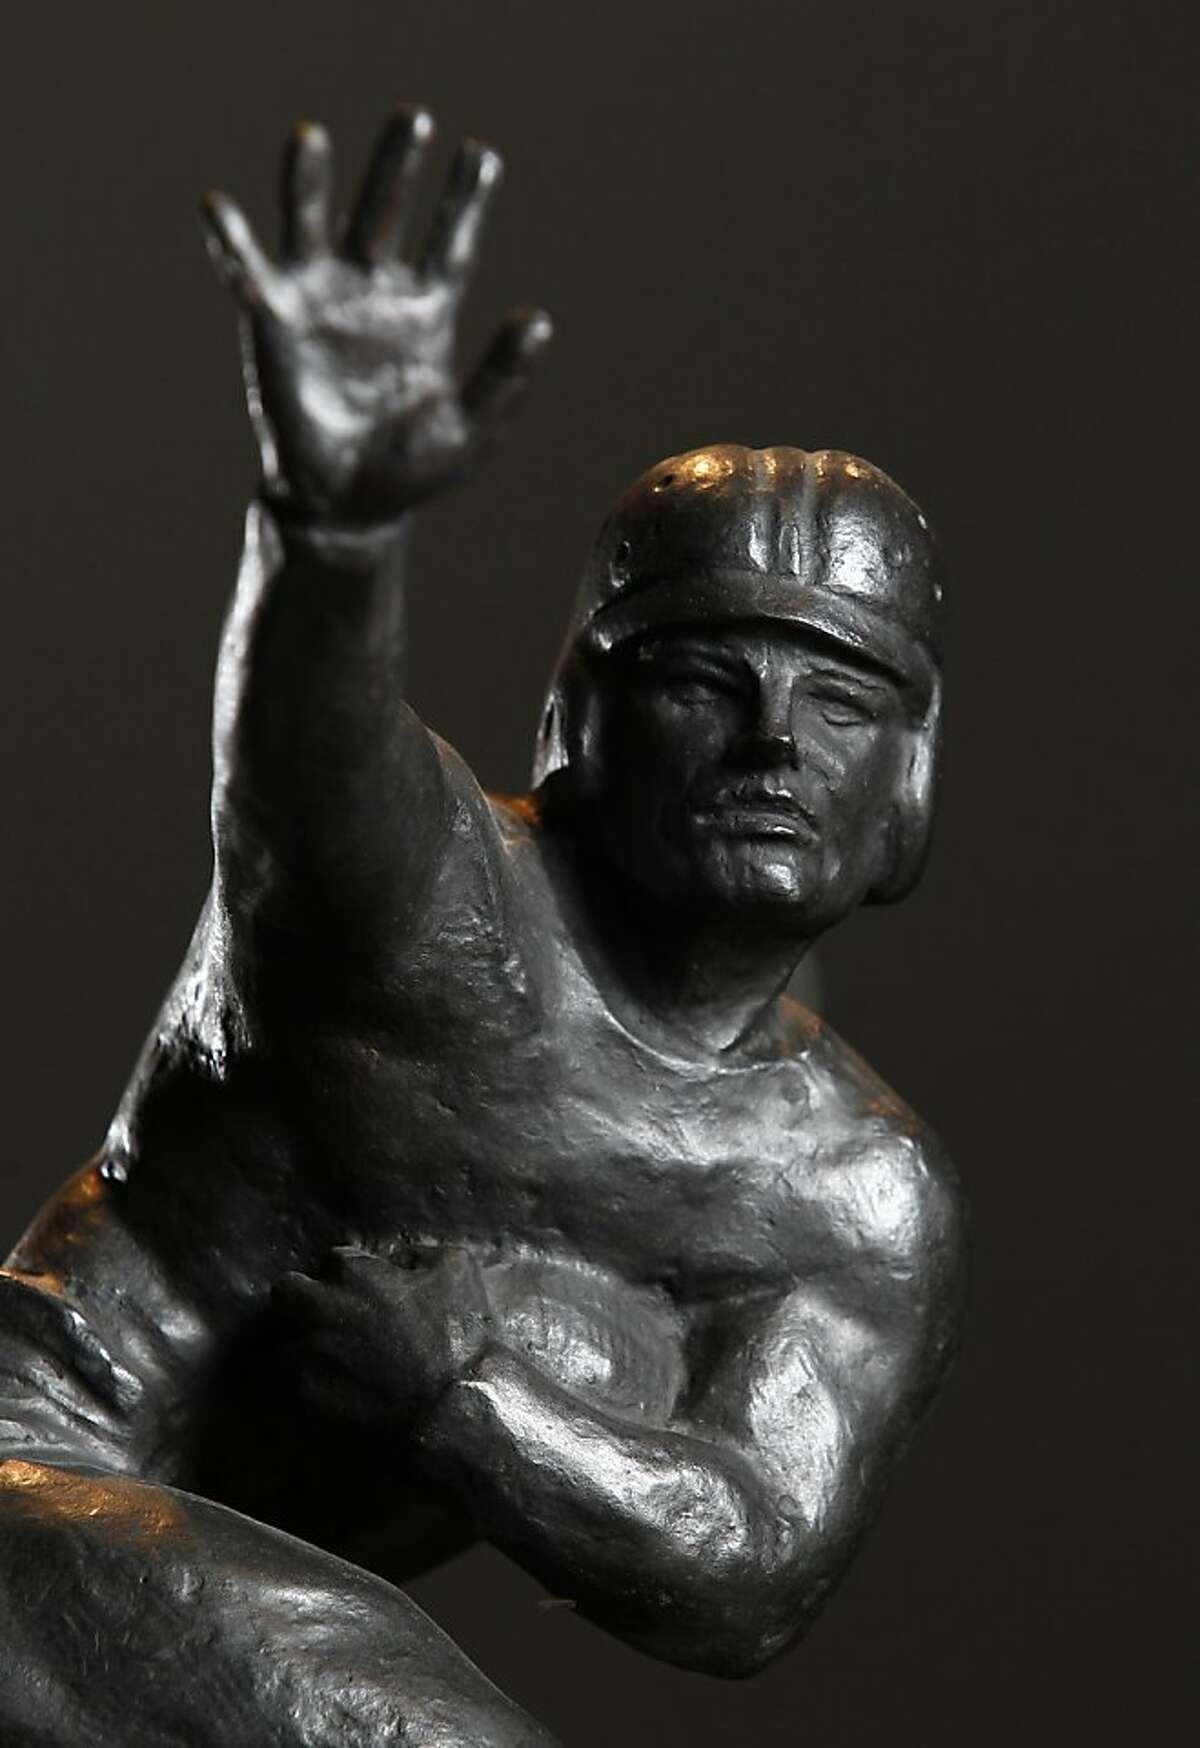 Jim Plunkett's Heisman trophy Monday, December 5, 2011 in Atherton, Calif.